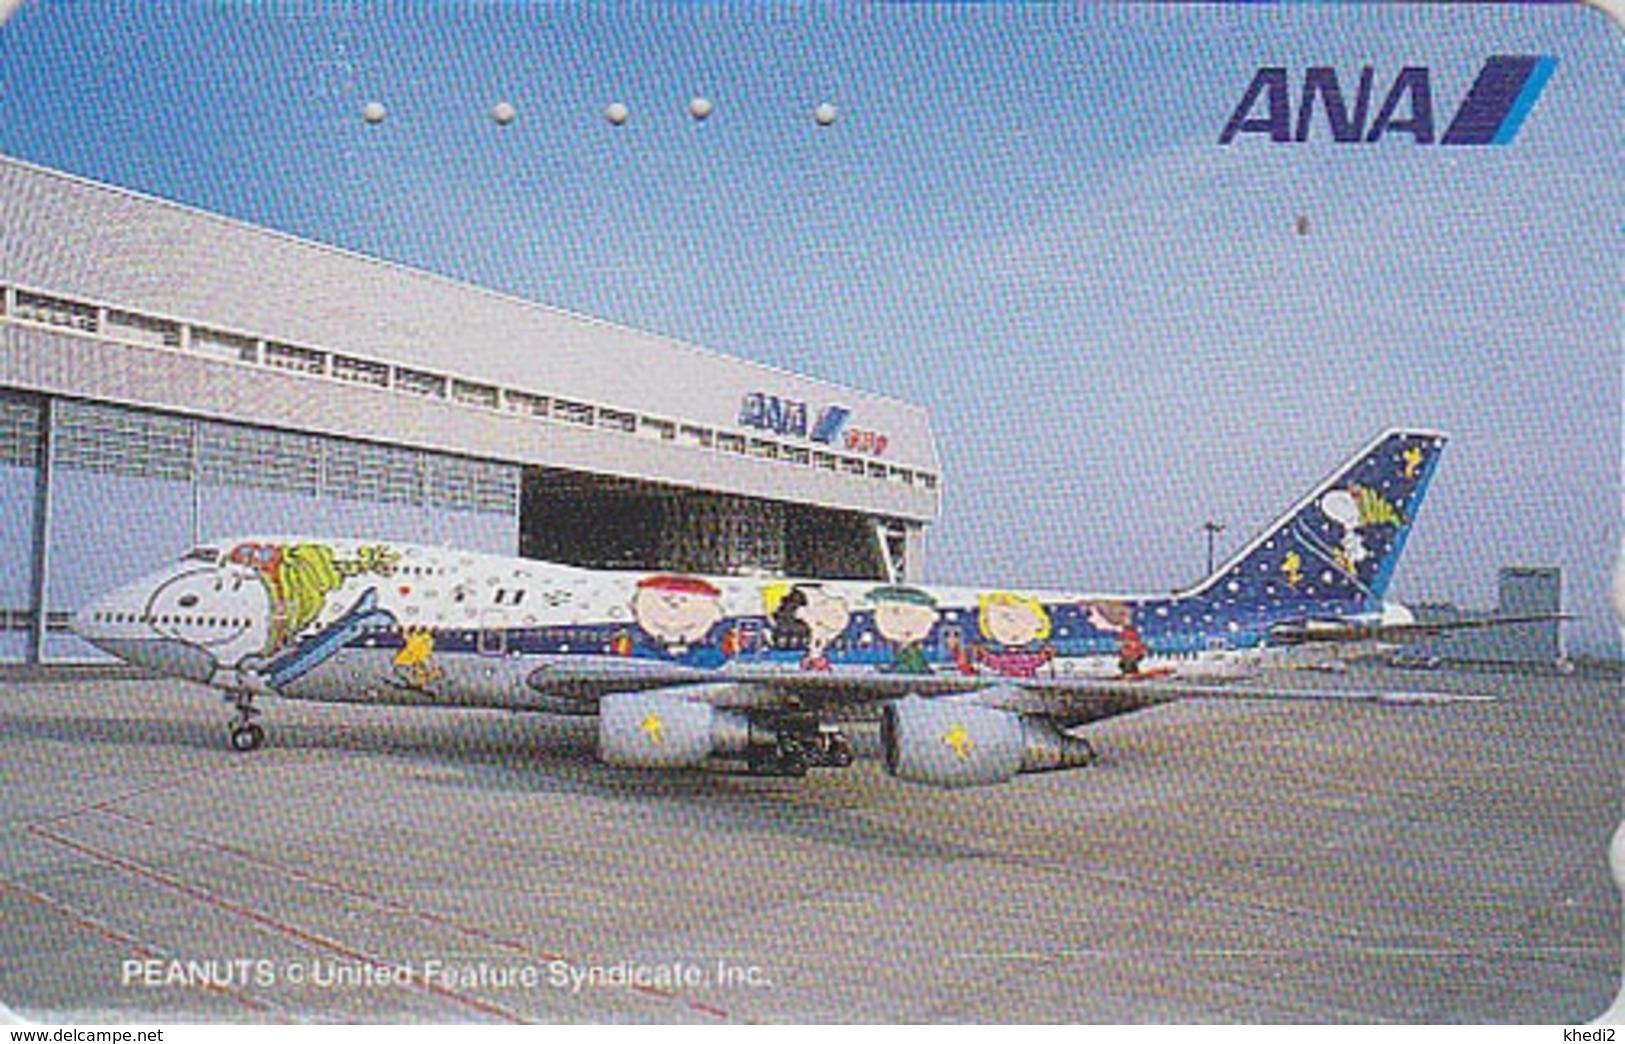 TC Japon / 110-016 - BD Comics - CHIEN SNOOPY * AVION ANA AIRLINES *  - PEANUTS DOG Japan Phonecard - Aviation 1375 - Flugzeuge